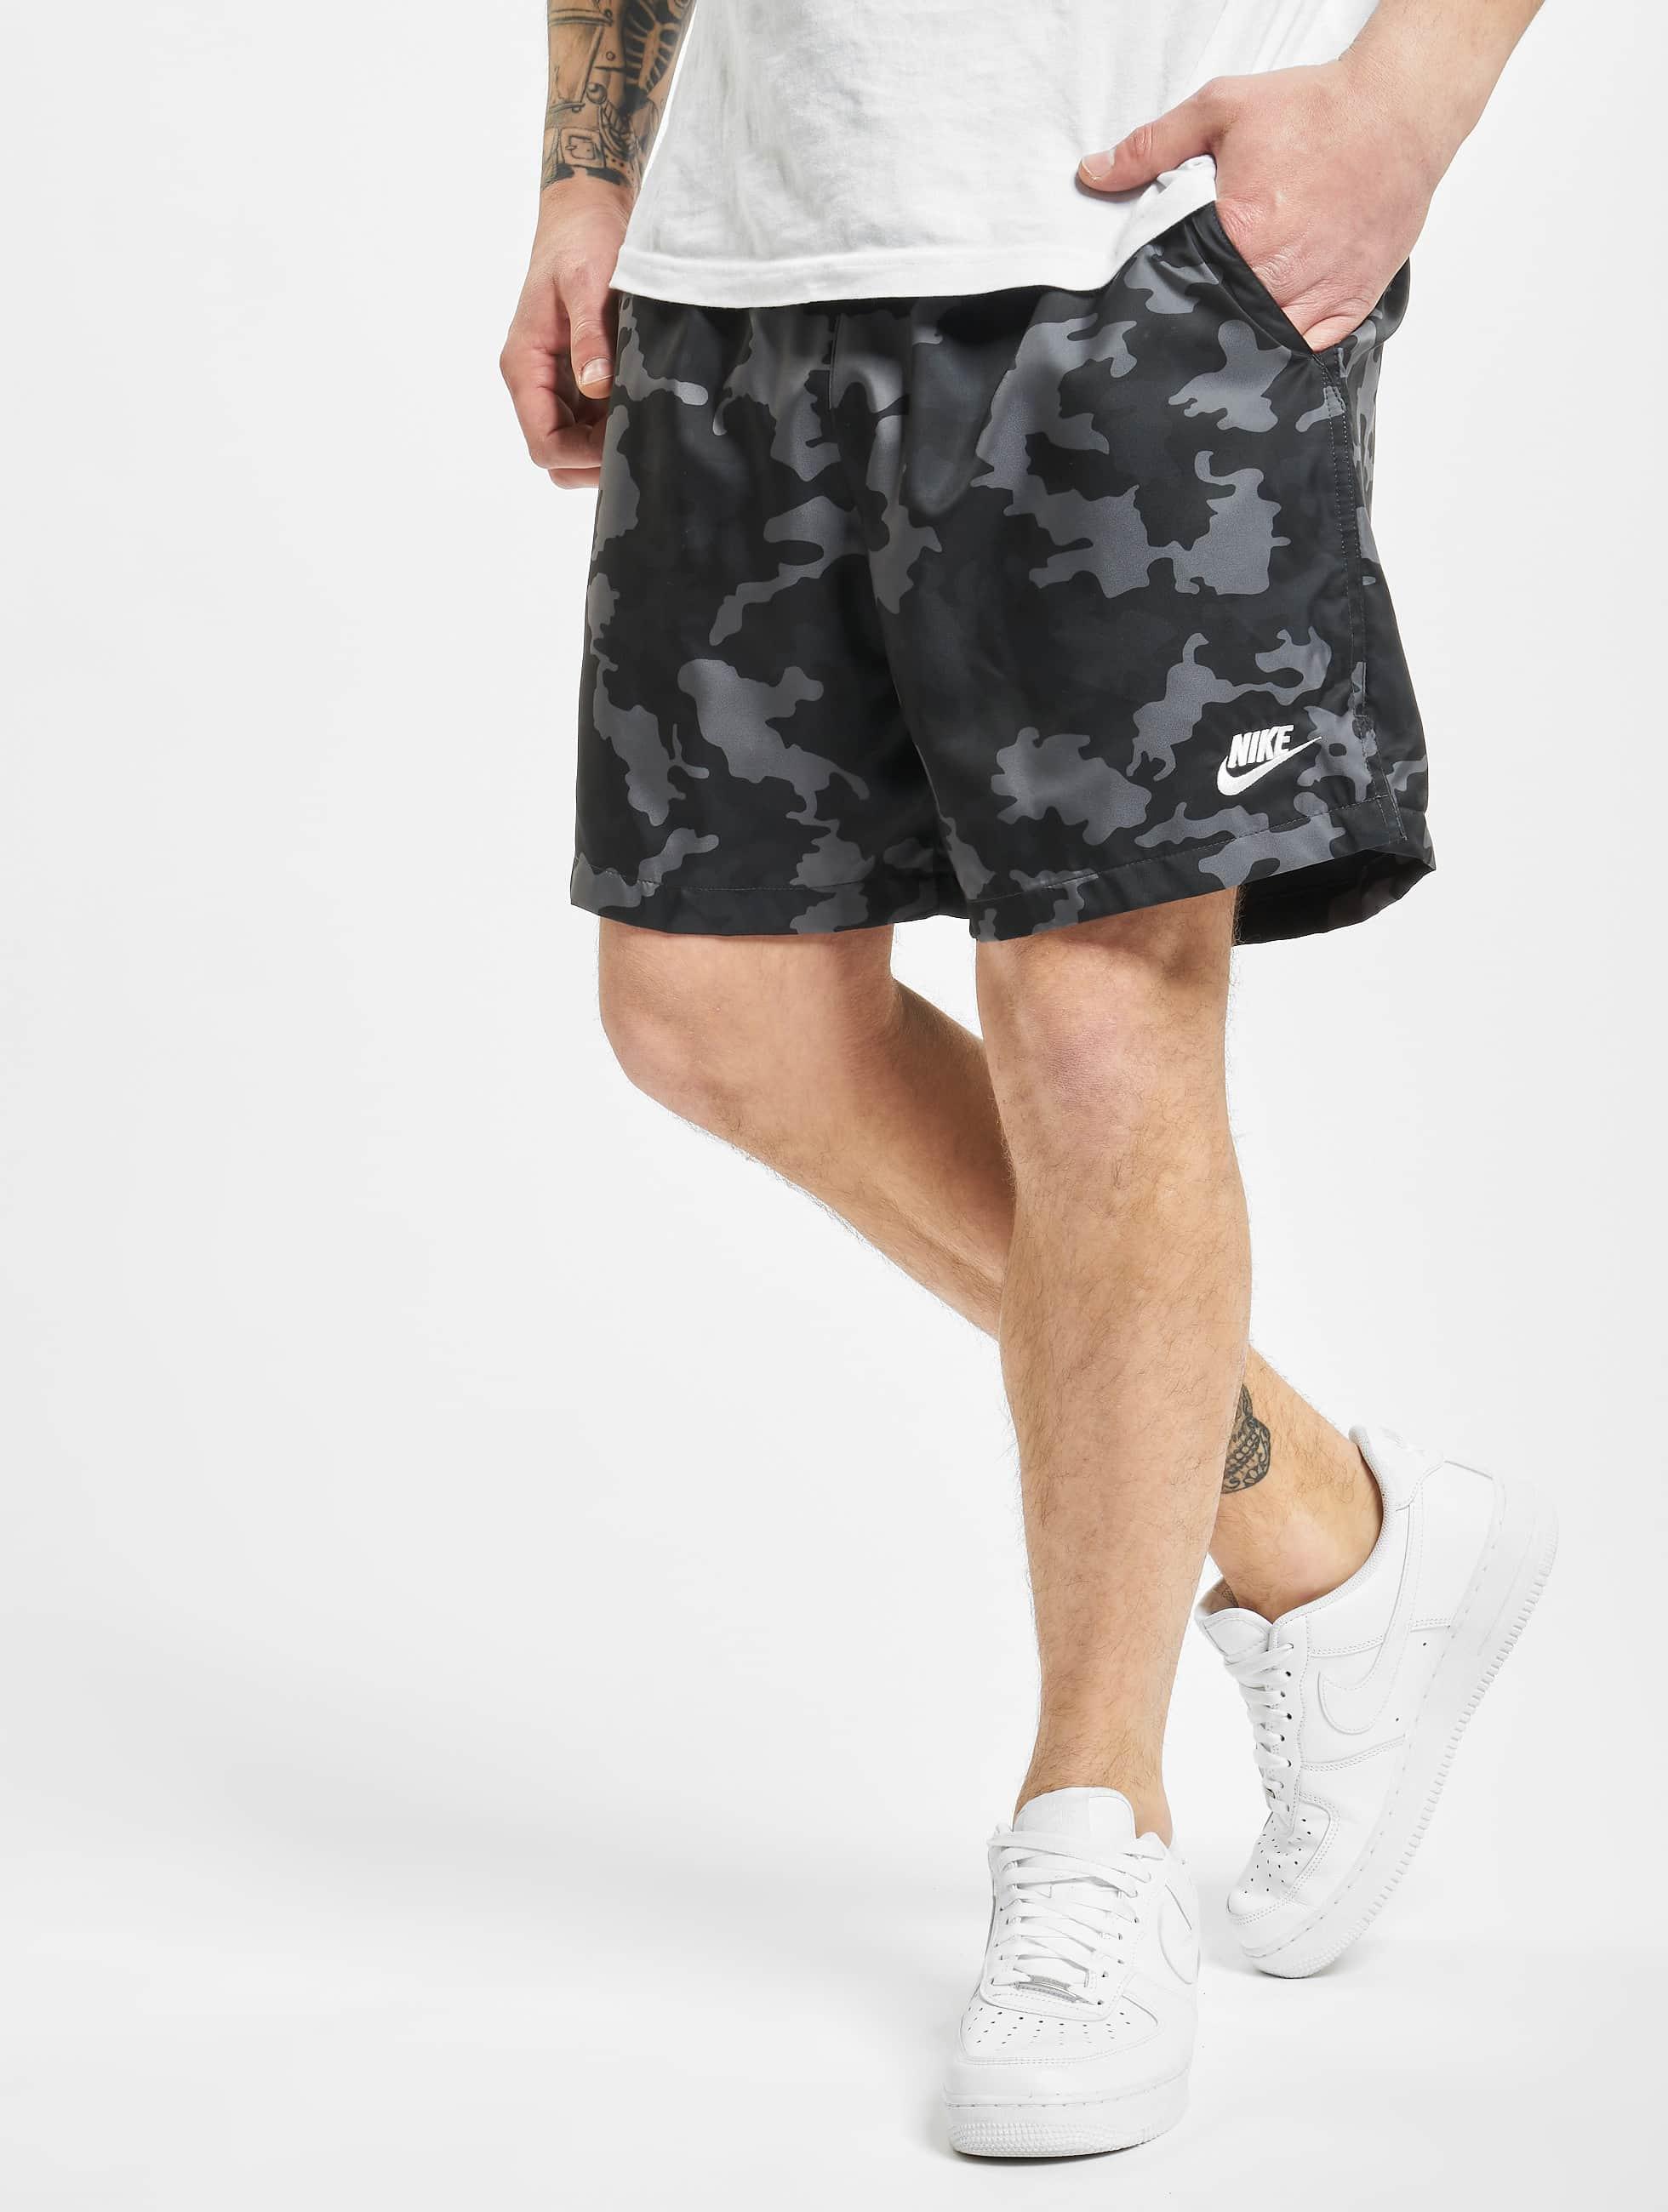 Nike Woven Flow Camo Shorts BlackBlackSmoke GreyWhite